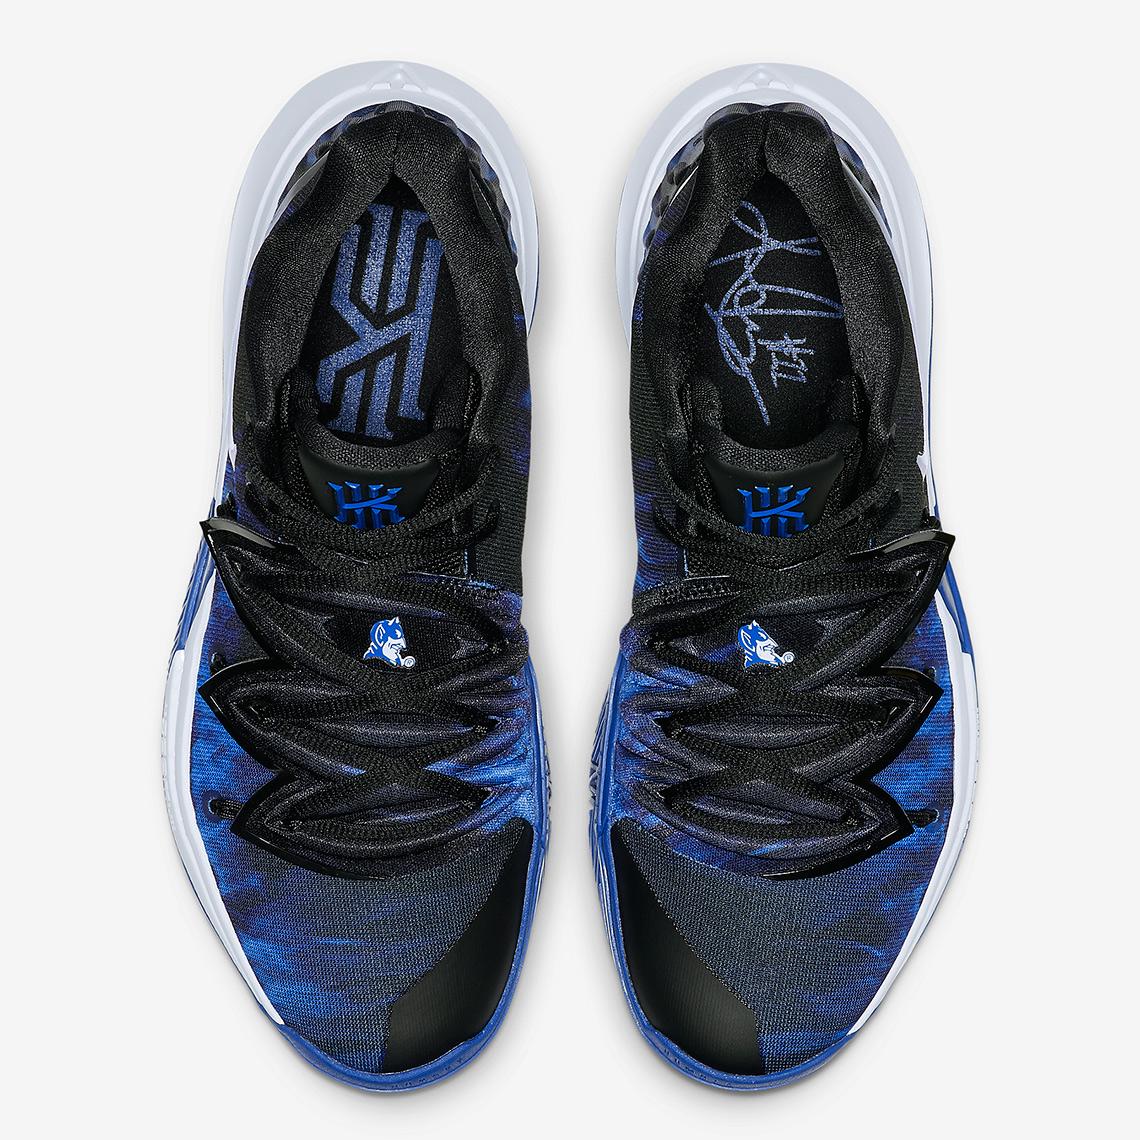 900b12626e61 Nike Kyrie 5 Duke PE CI0306-901 Release Info